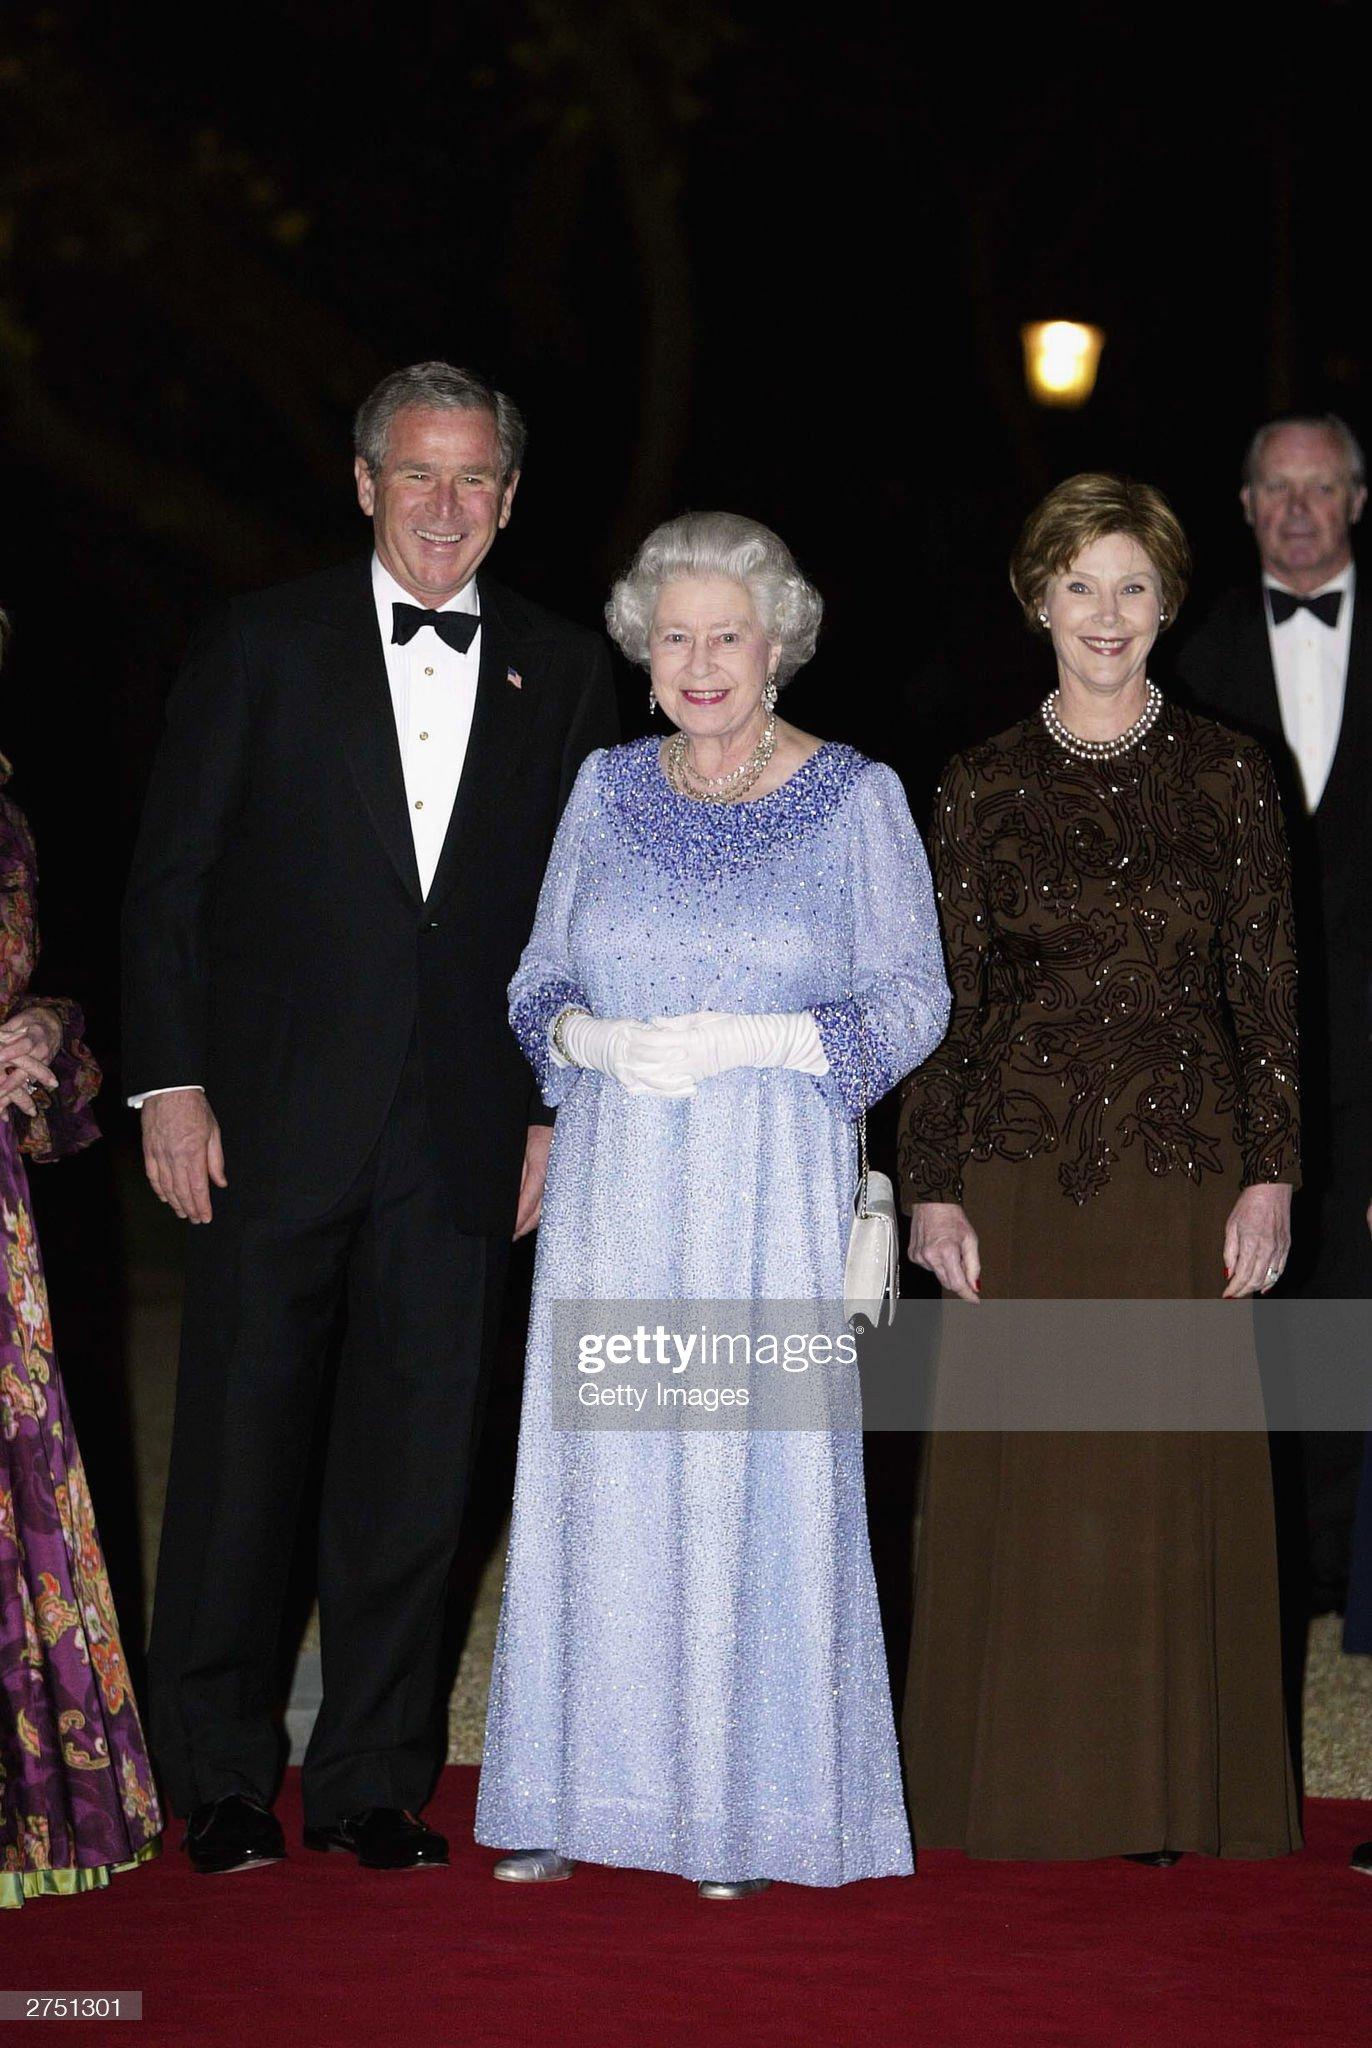 British Royalty Attend U.S. President's Return Banquet : News Photo